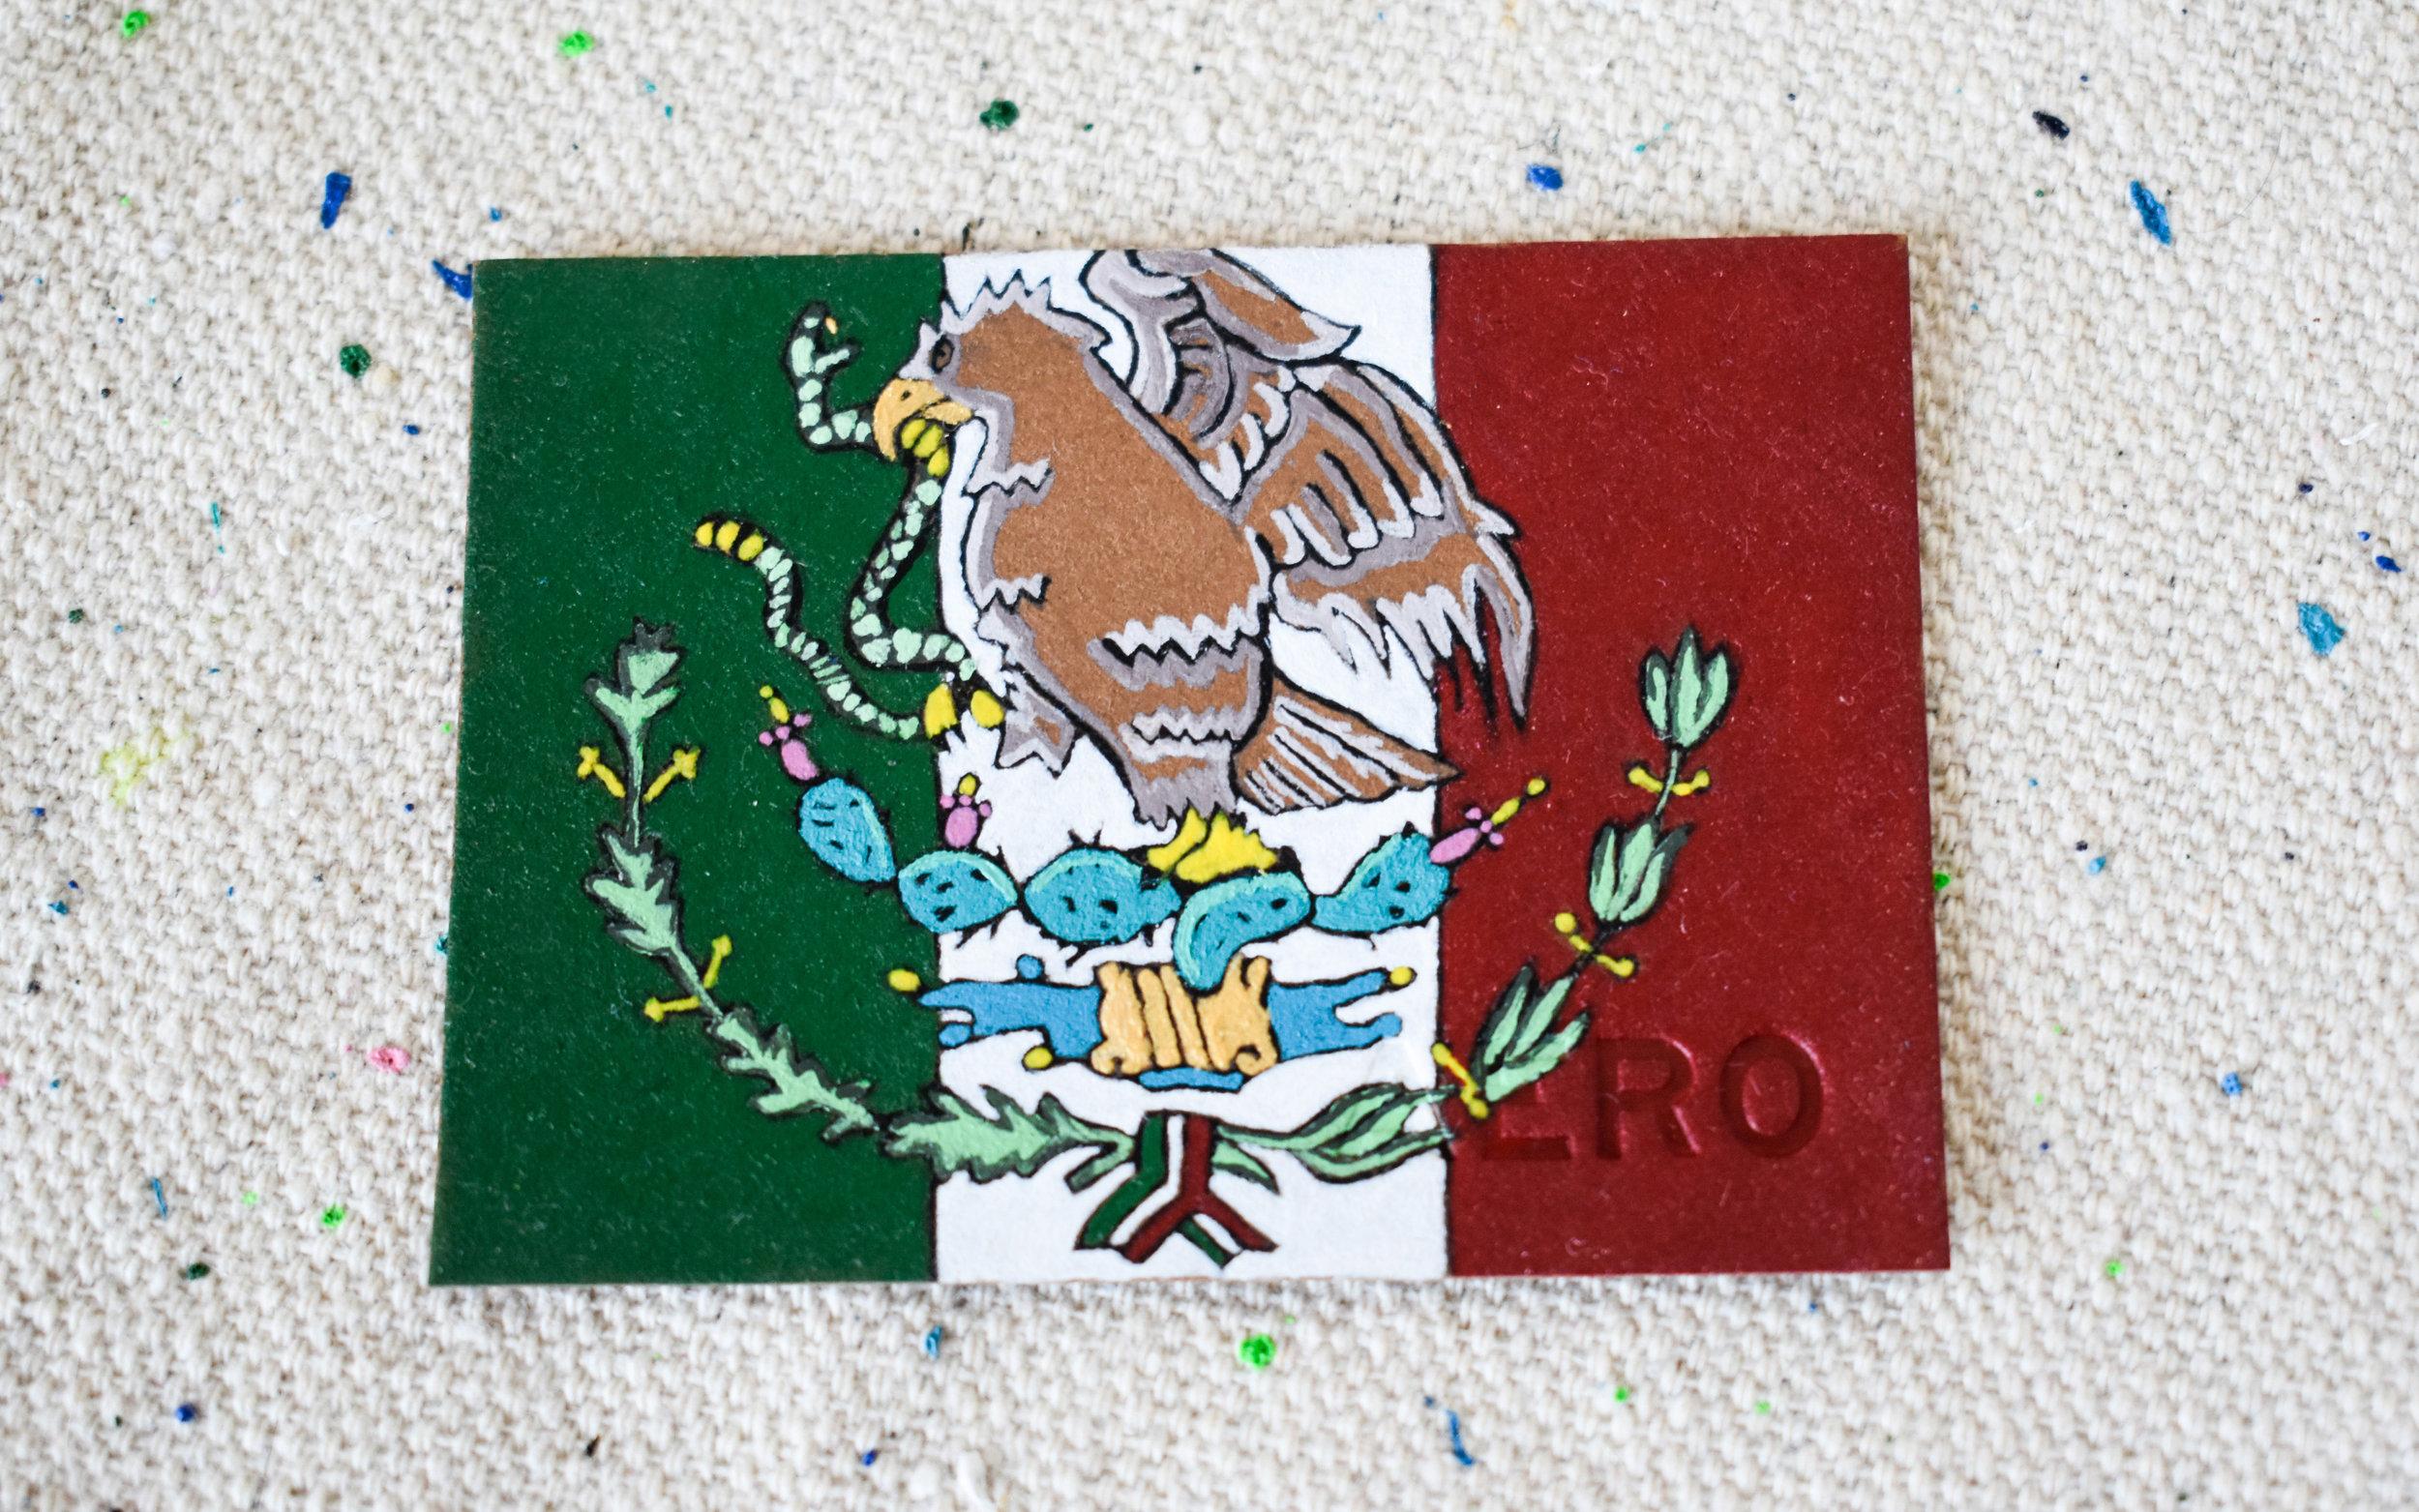 Who-leesa_x_AERO_banderas_1a.jpg